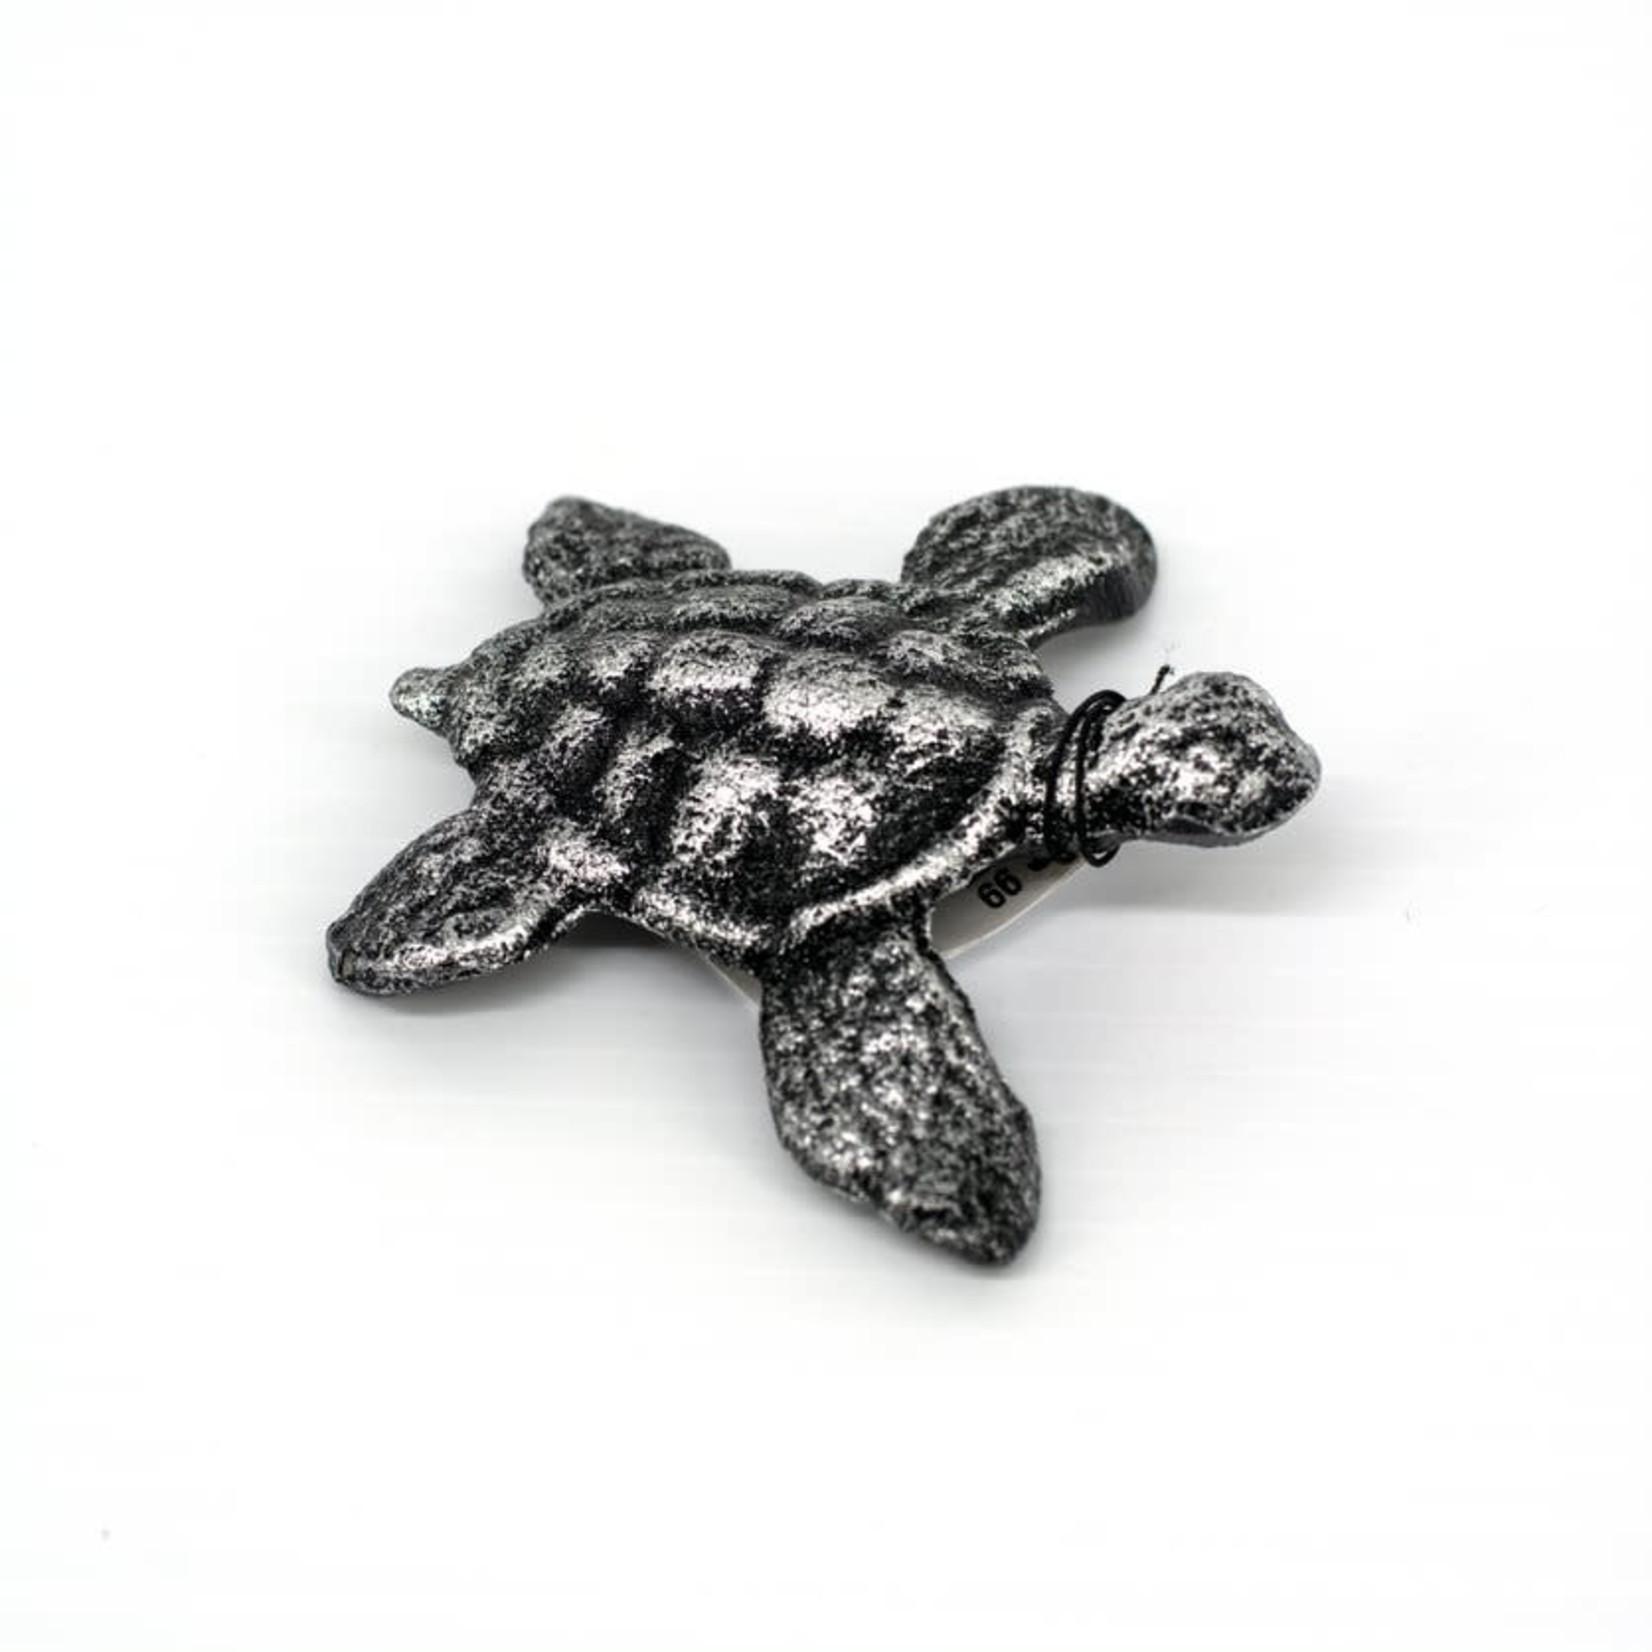 Cast Iron Turtle Figurines